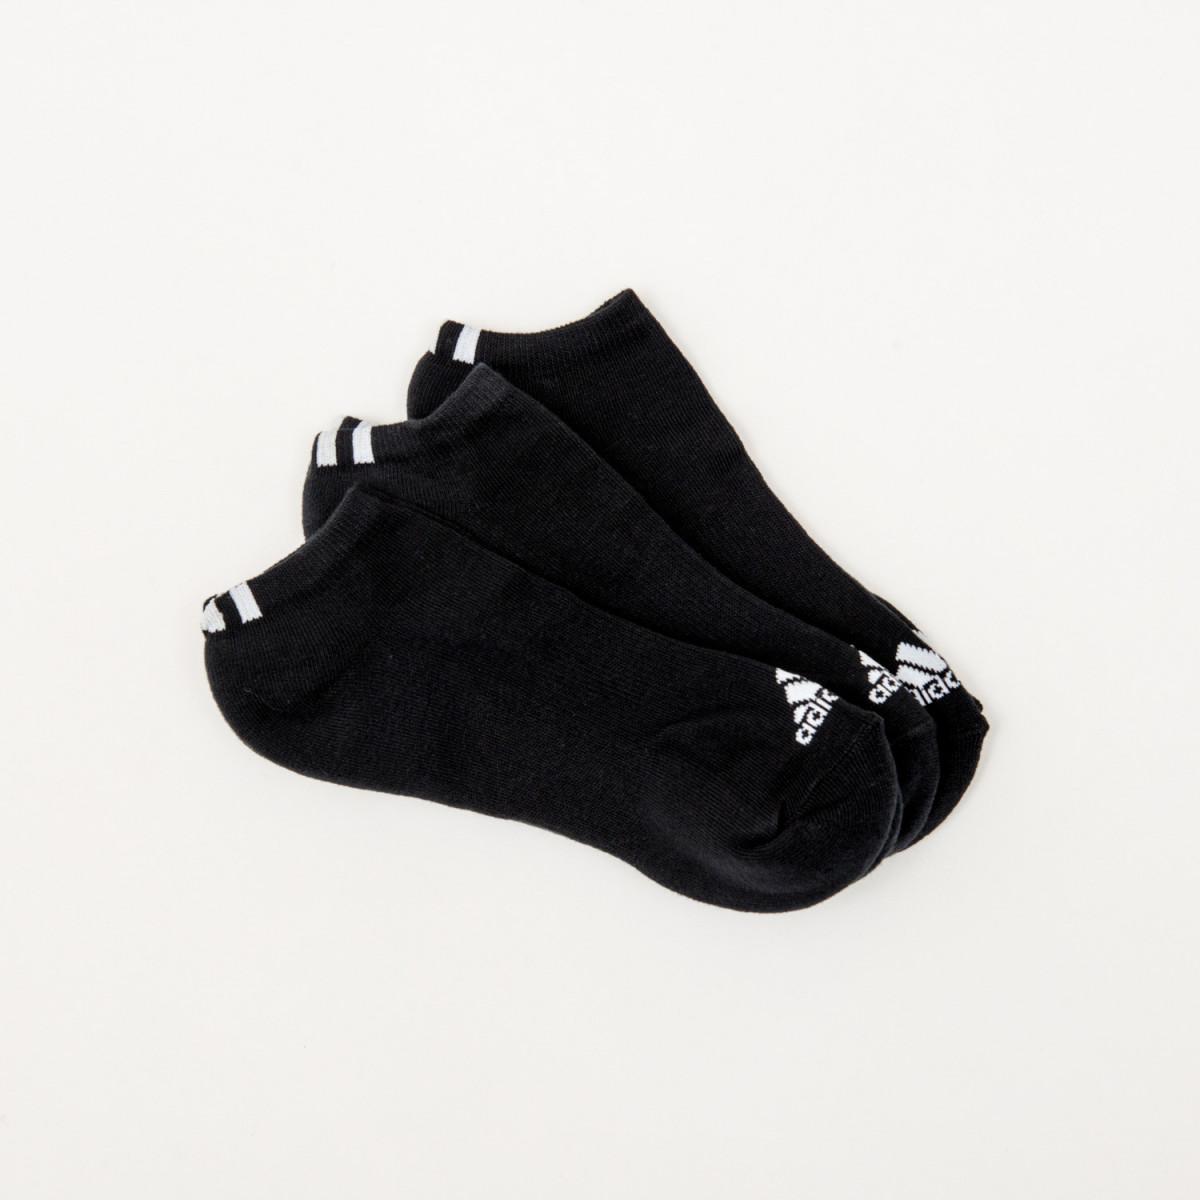 Medias Adidas Confortlw3